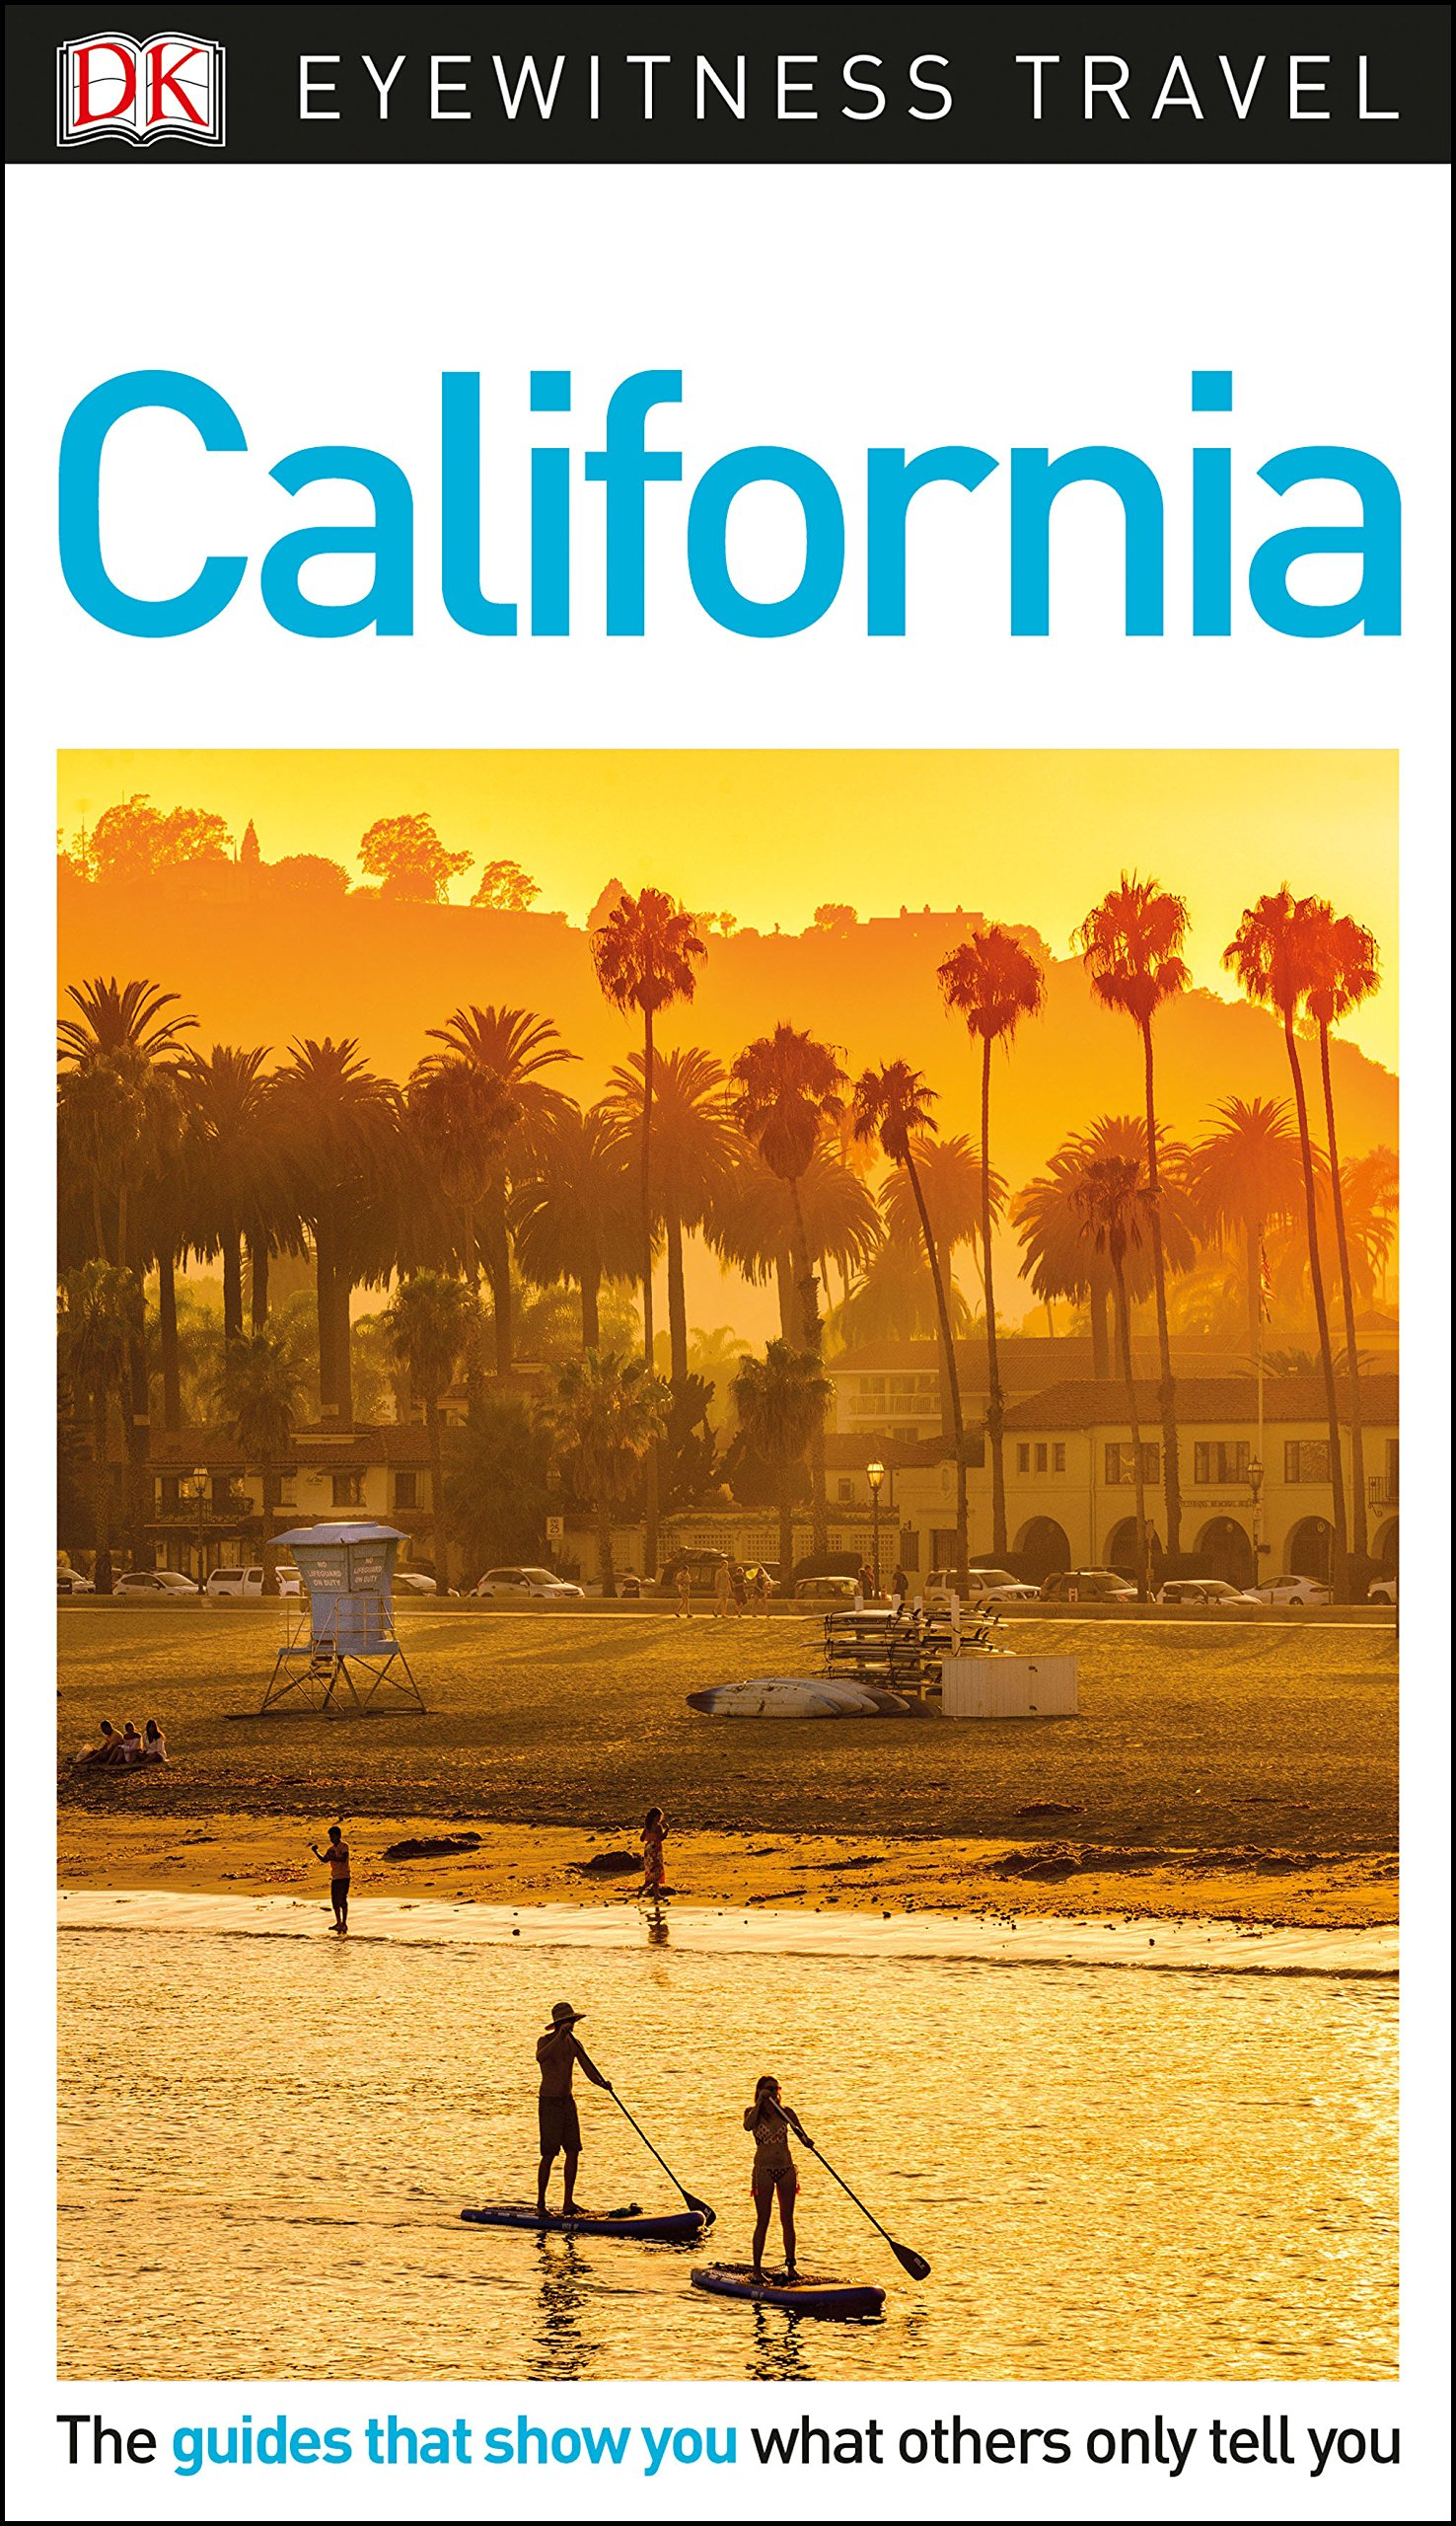 Read Online DK Eyewitness Travel Guide California PDF